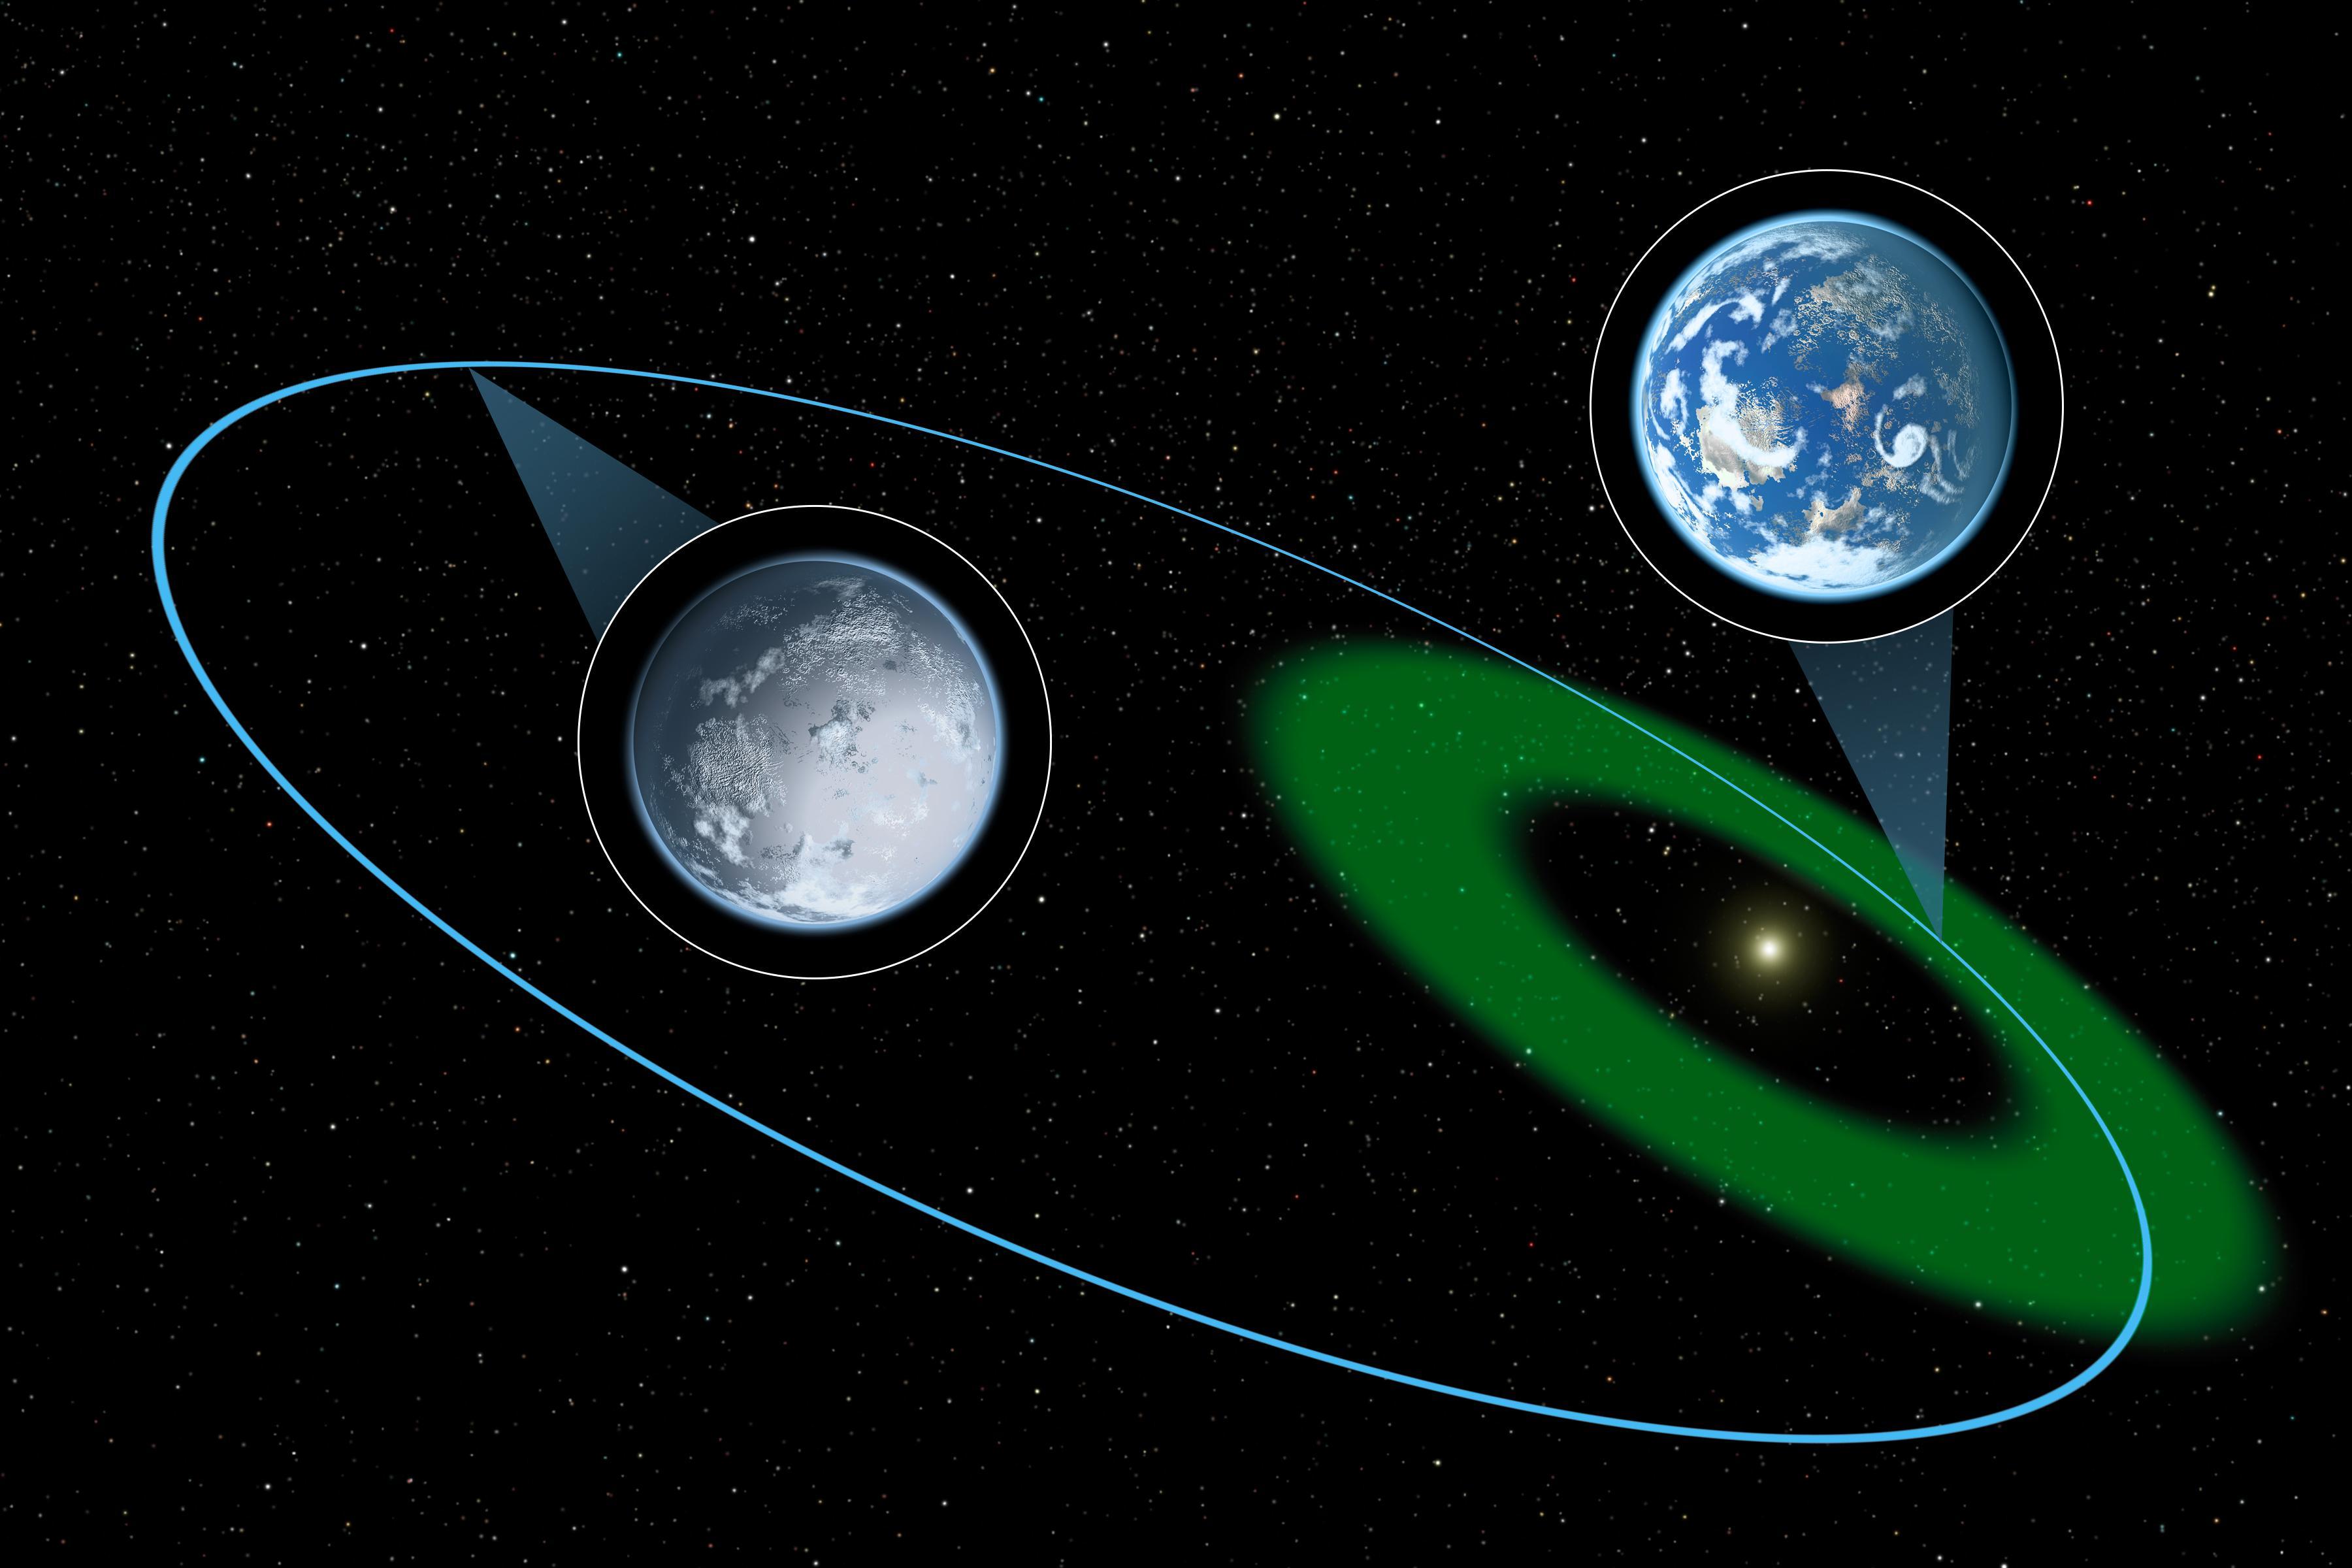 brown dwarf habitable planet - photo #14